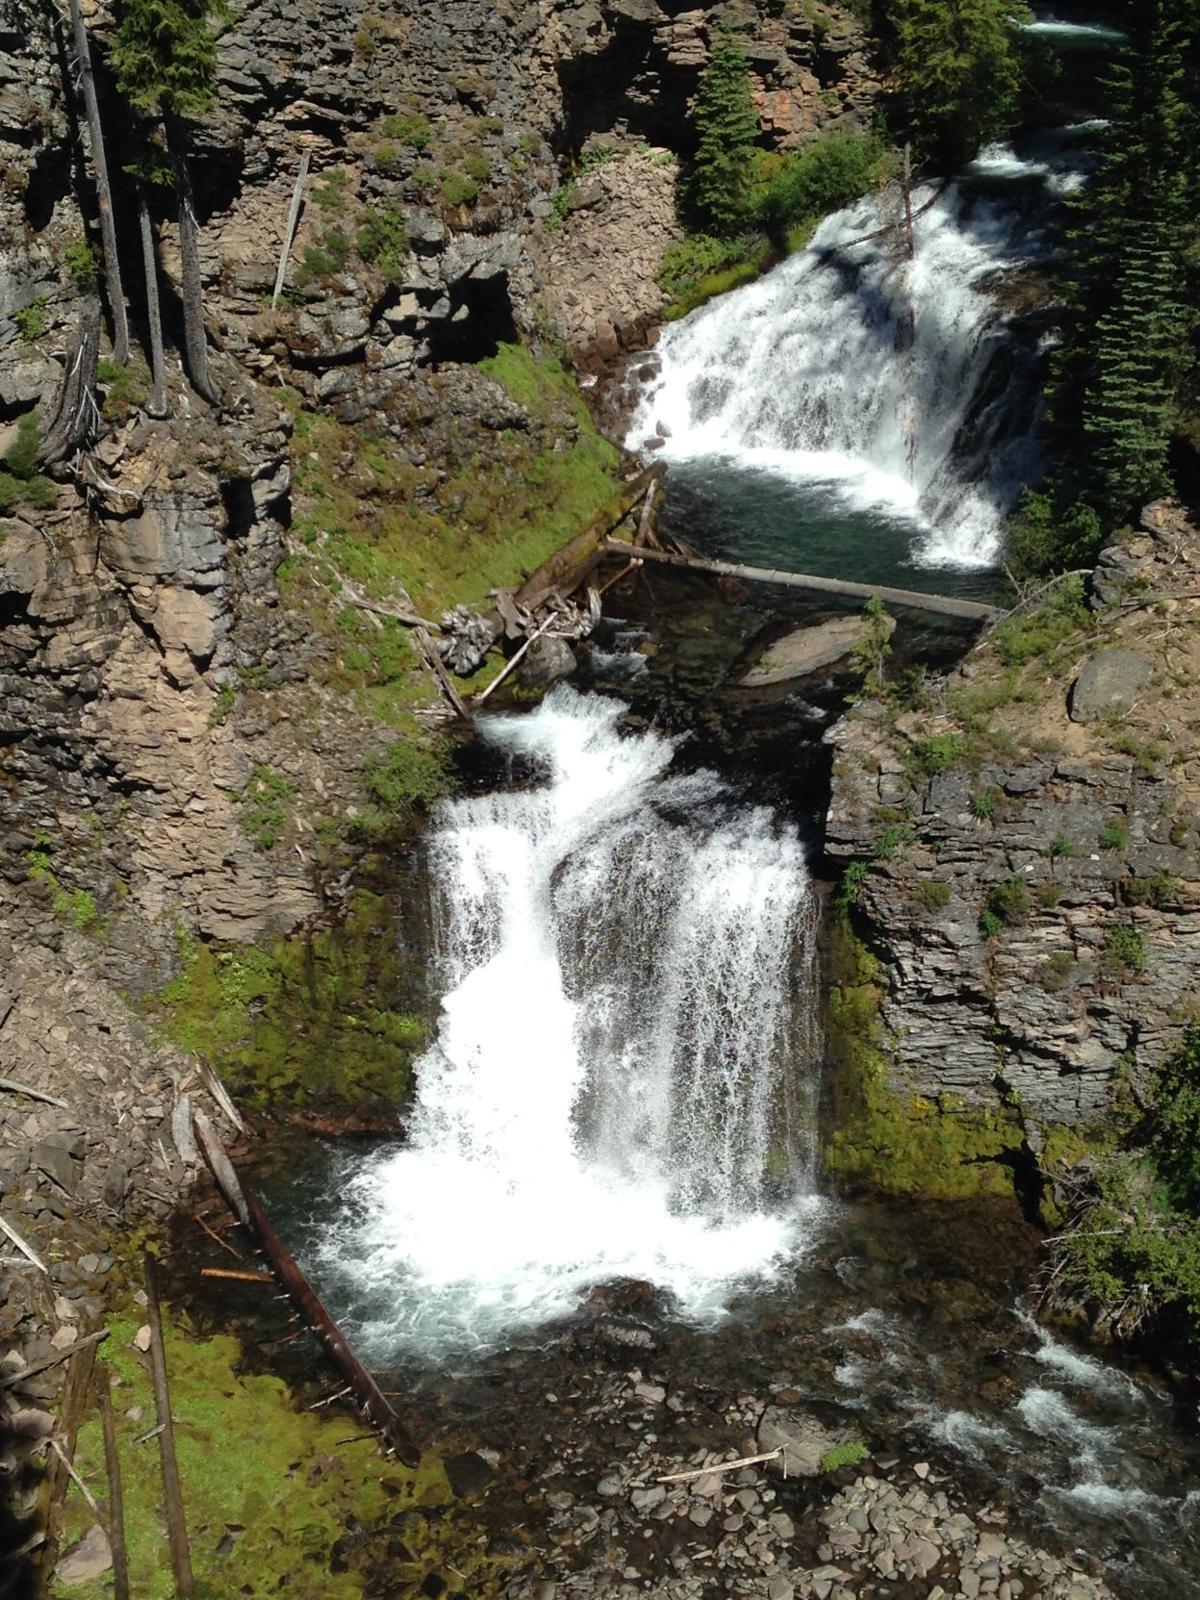 Mountain Bike Trail Guide: North Fork-Farewell Loop